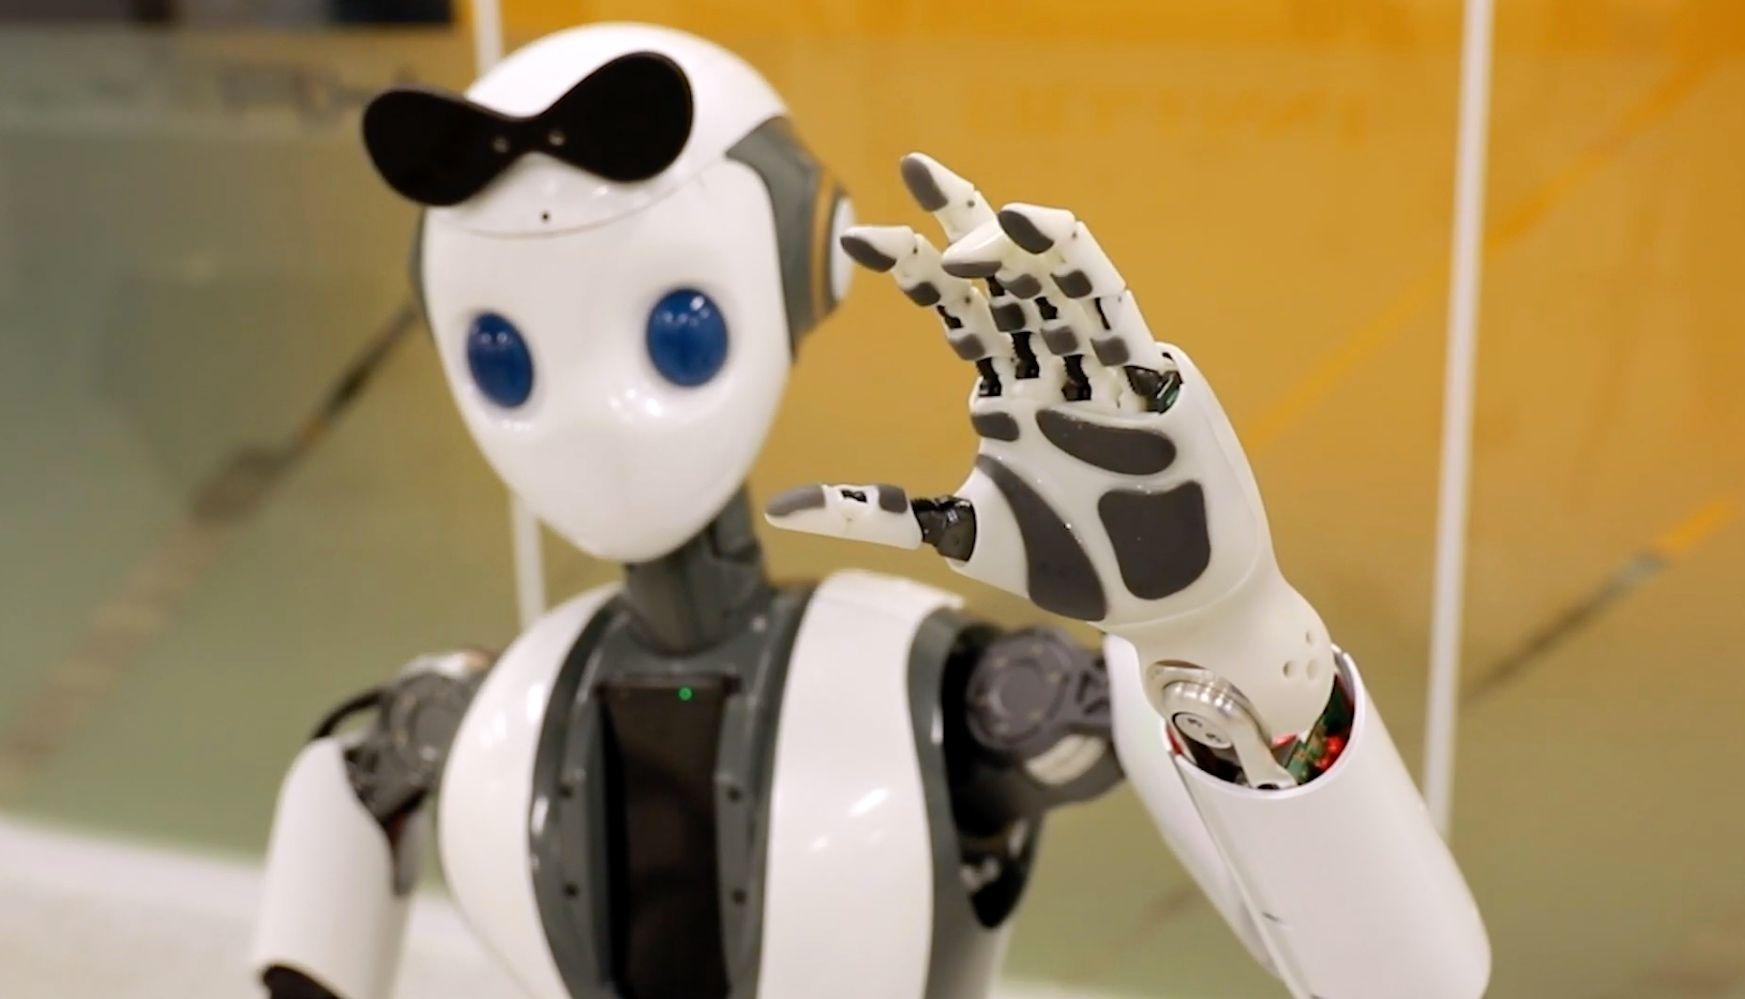 Innfos HR-1 Humanoid Robot